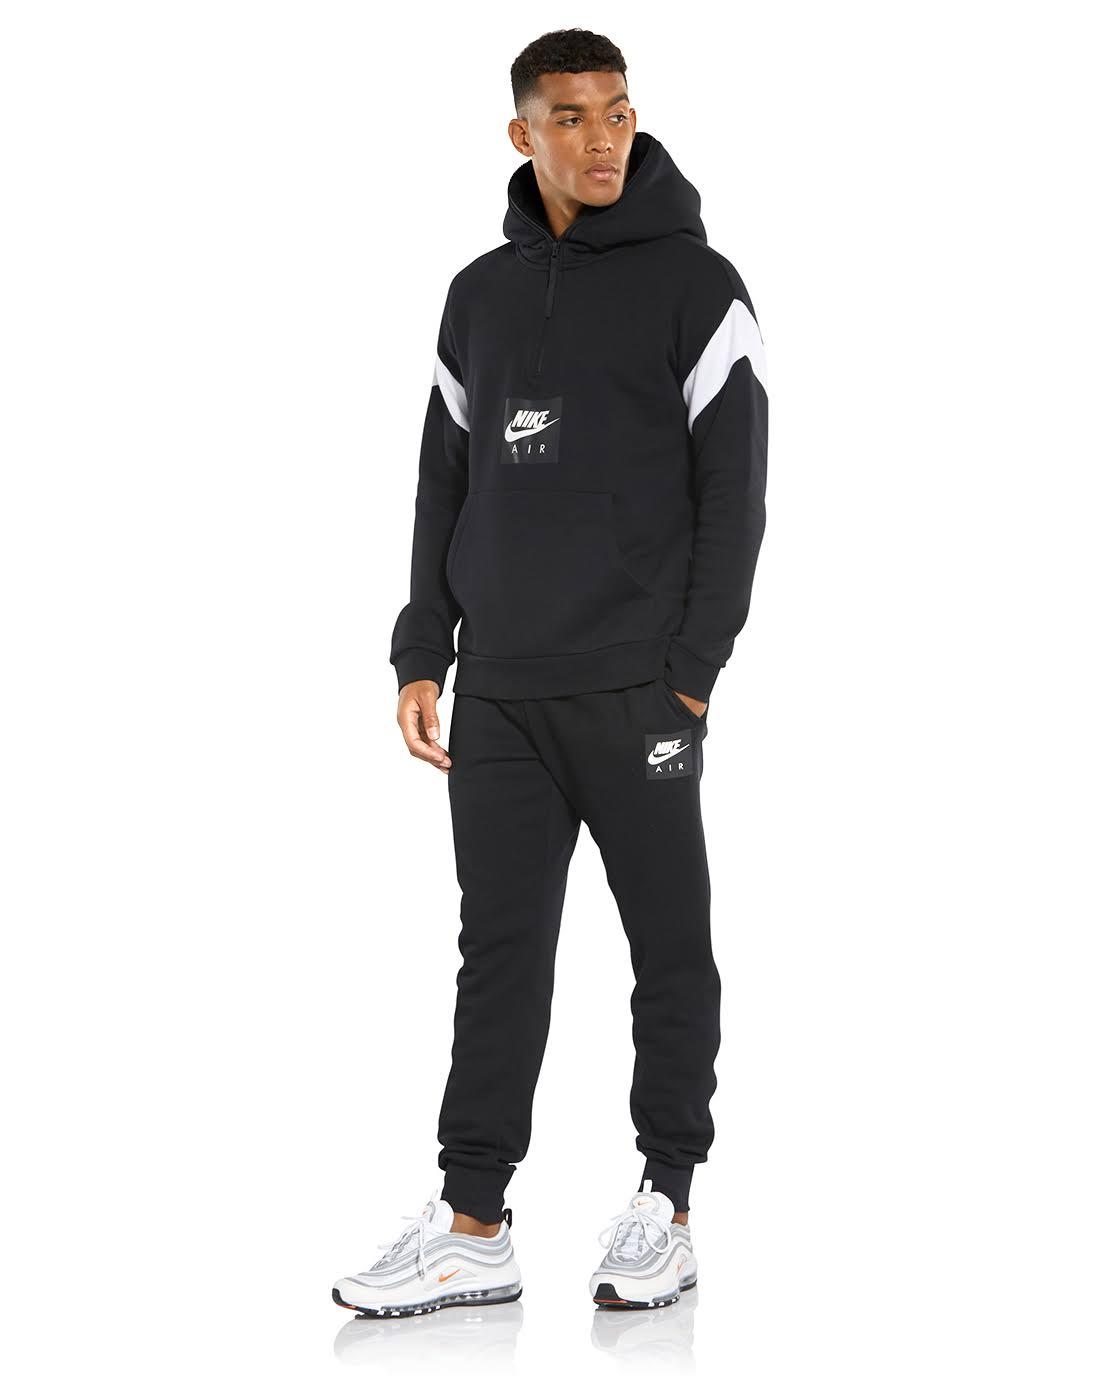 Air Skinny Nike black Black Joggers Black In 928637 010 4qpTpwdnx